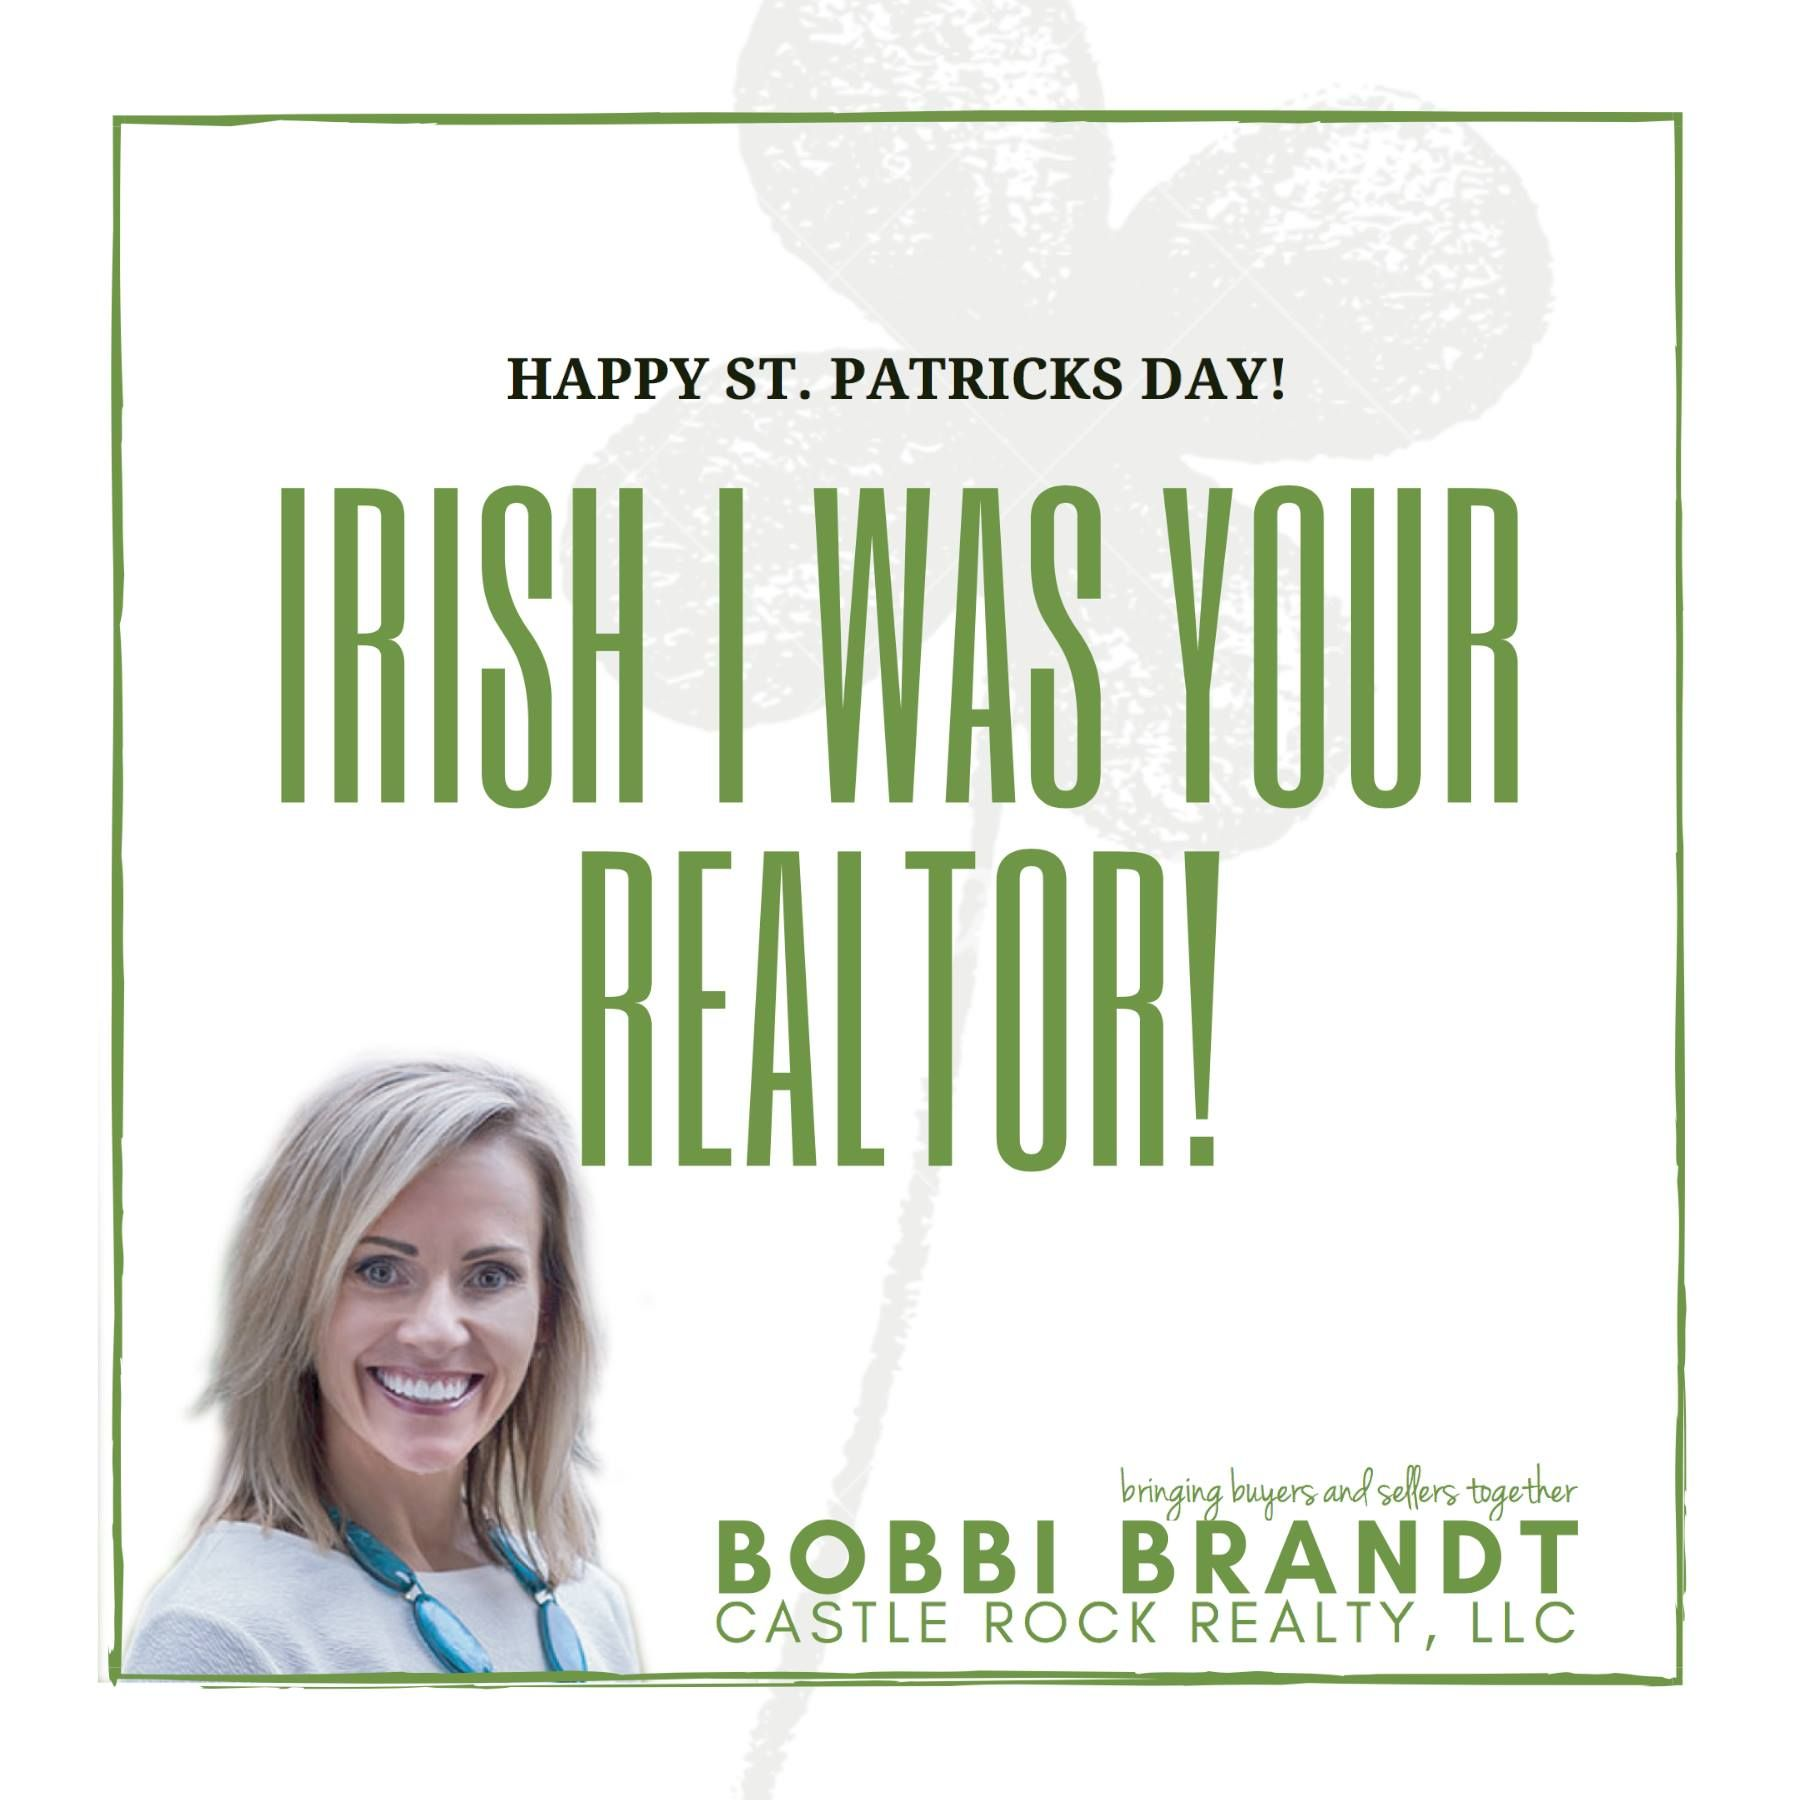 70f99d2dcb4d5047b6d76b2470de0160 - How To Get A Real Estate License In Ireland